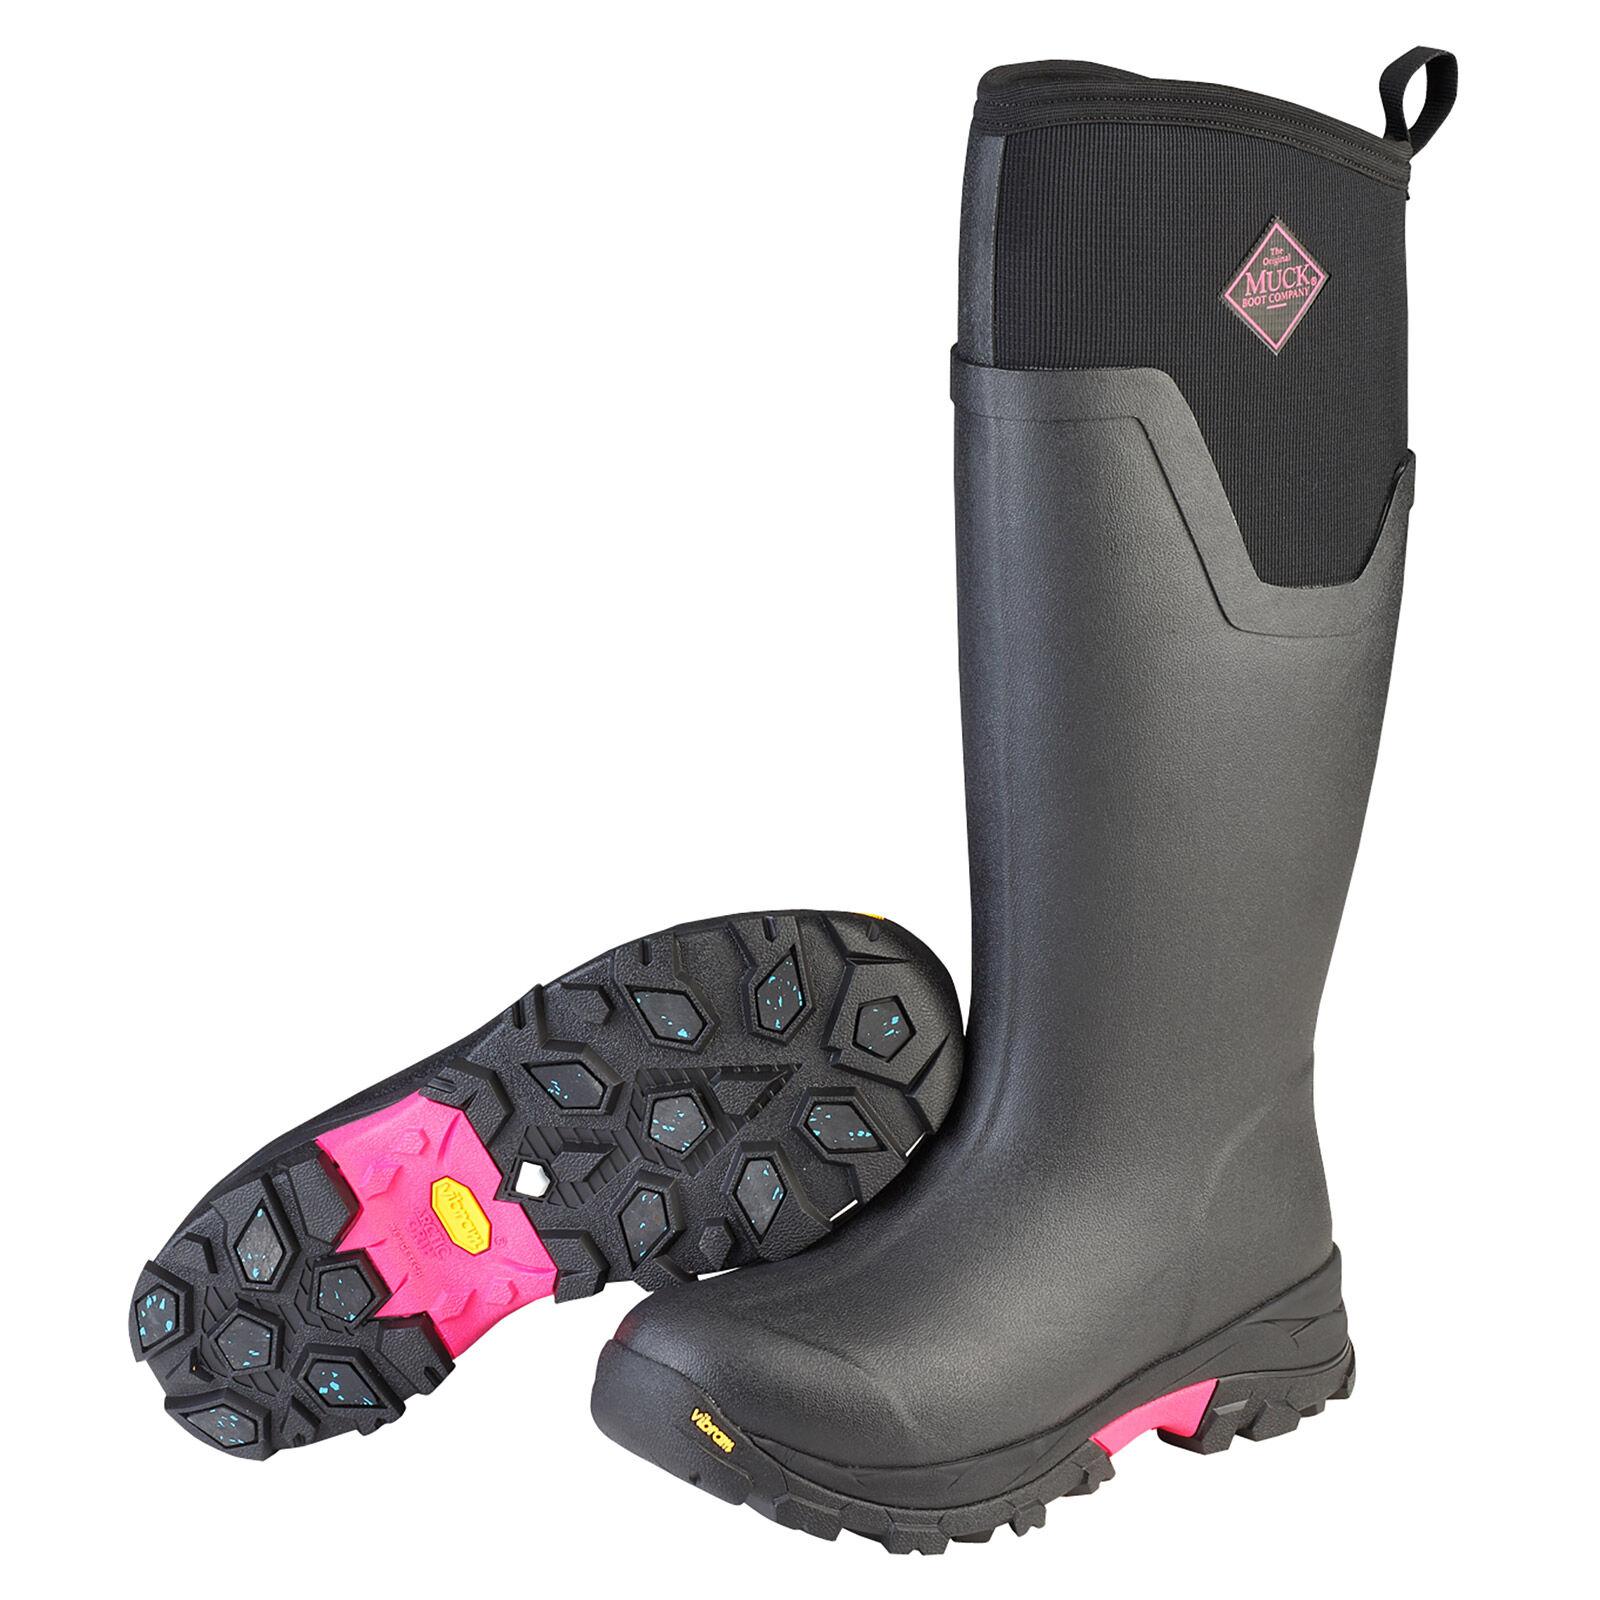 Gray Bottes Muck Boot Arctic Weekend Black Brown-Taille 37  Chaussures de Randonnée Basses Femme Drk9lzAm